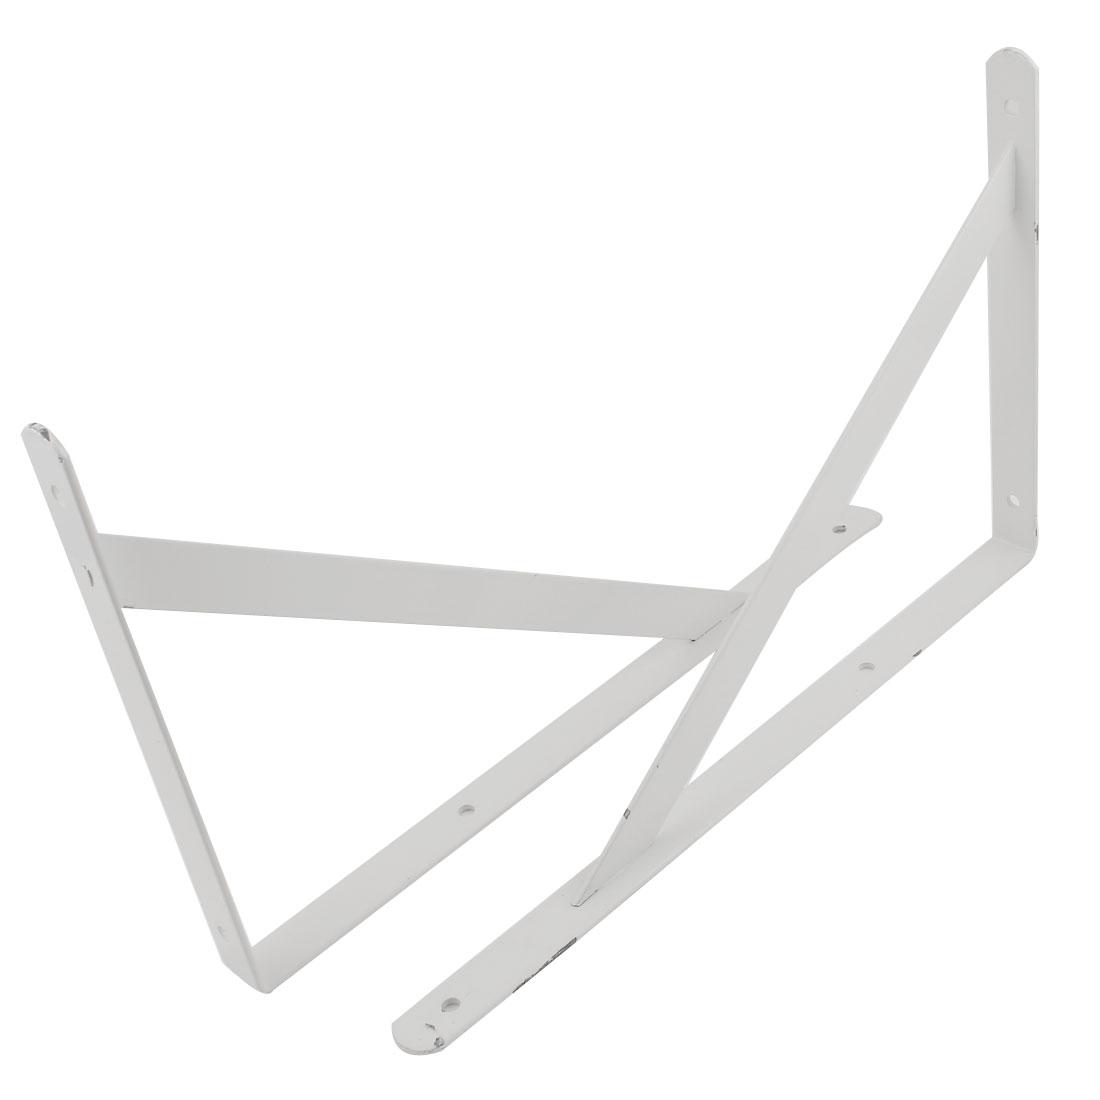 "2 Pcs White Right Angle Book Goods Wall Mounted Shelf Brackets 16"" x 10"""